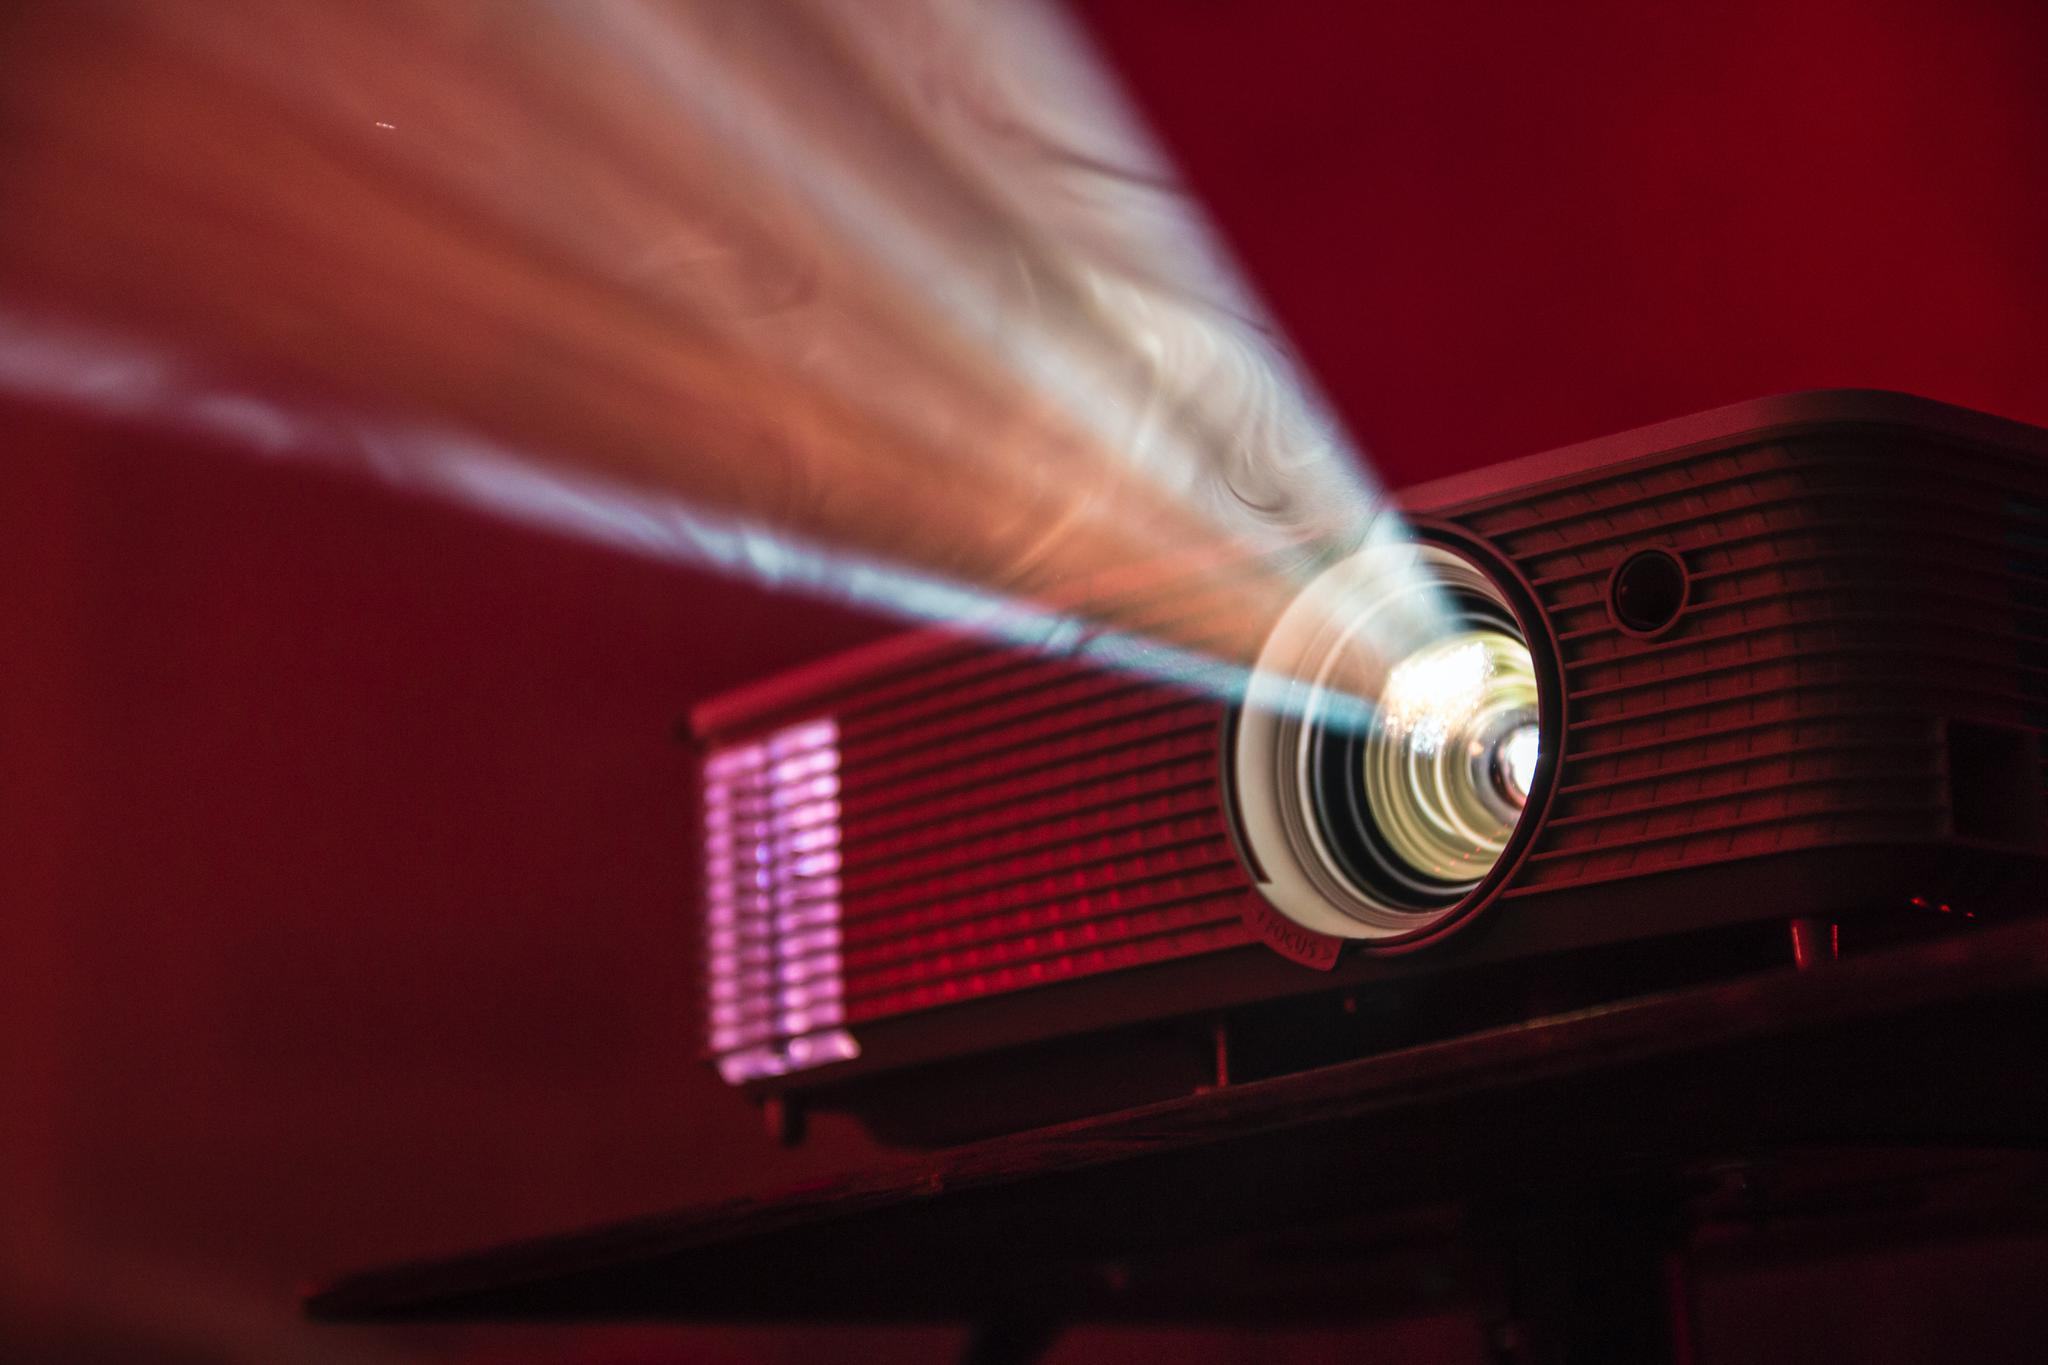 OPPO智能电视K9体验:这就是4K电视的超值之选